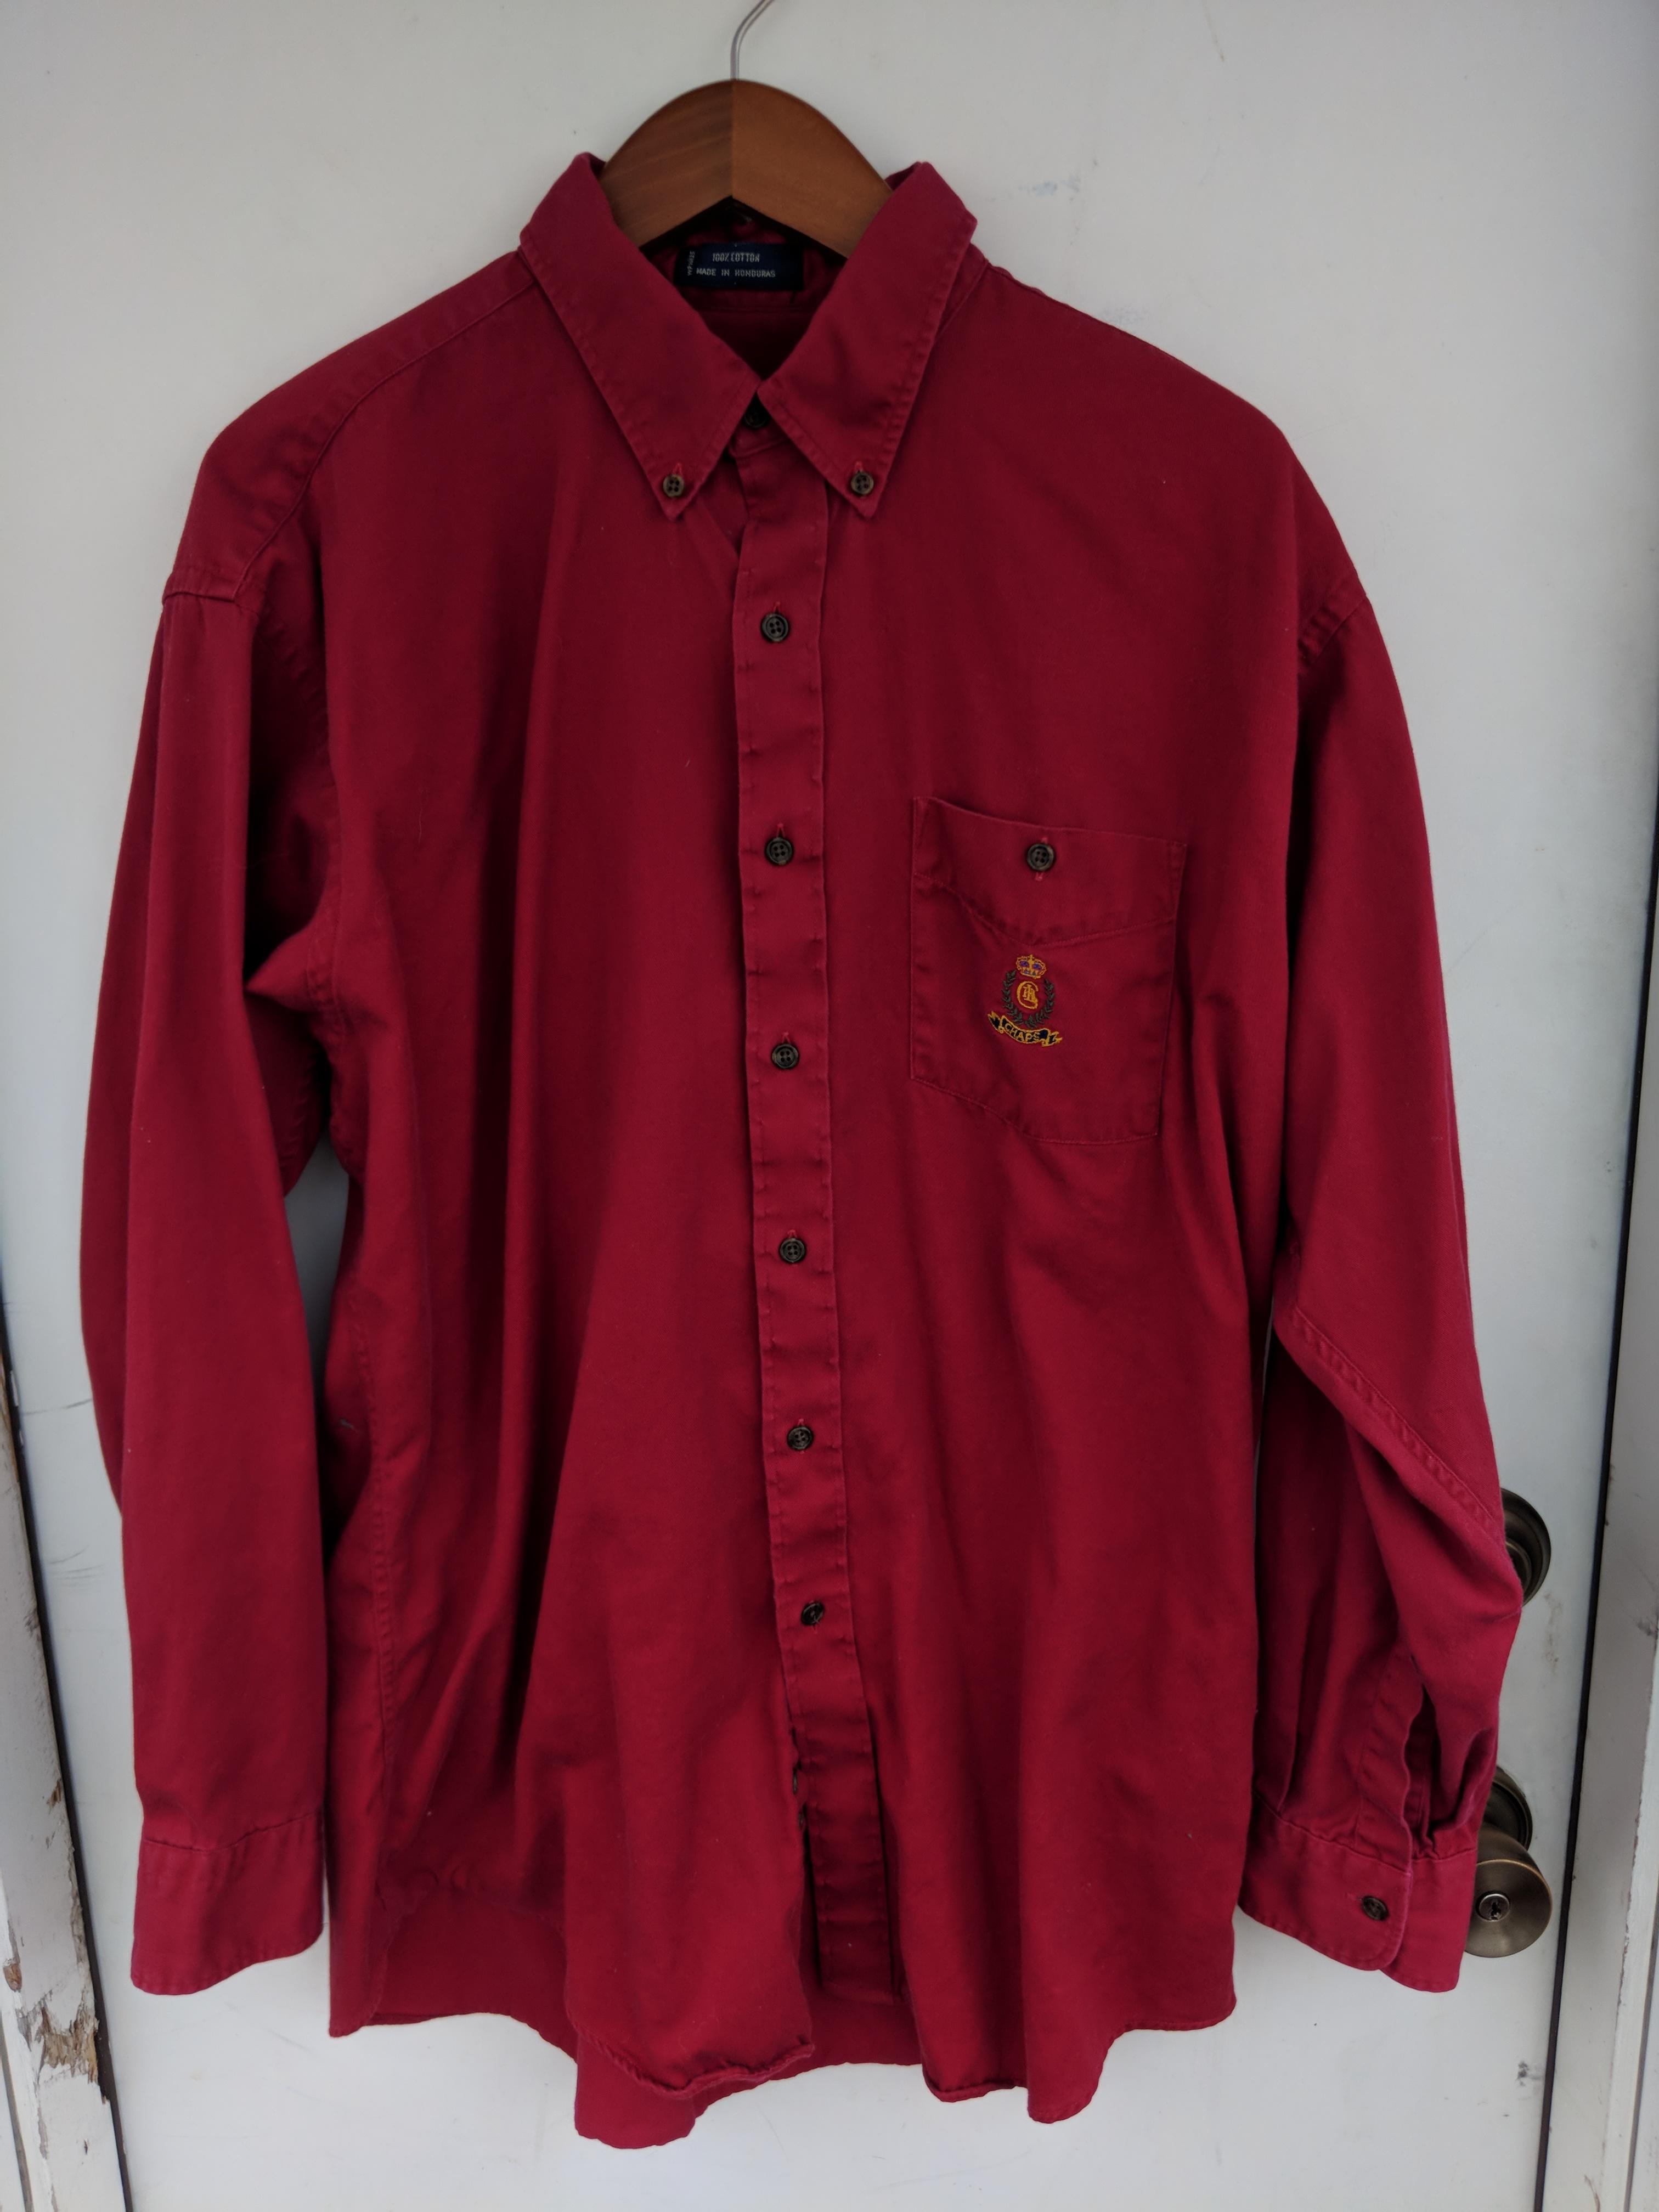 9696e1f9f85927 Chaps Ralph Lauren Vintage Chaps X Ralph Lauren Red Button Up | Grailed